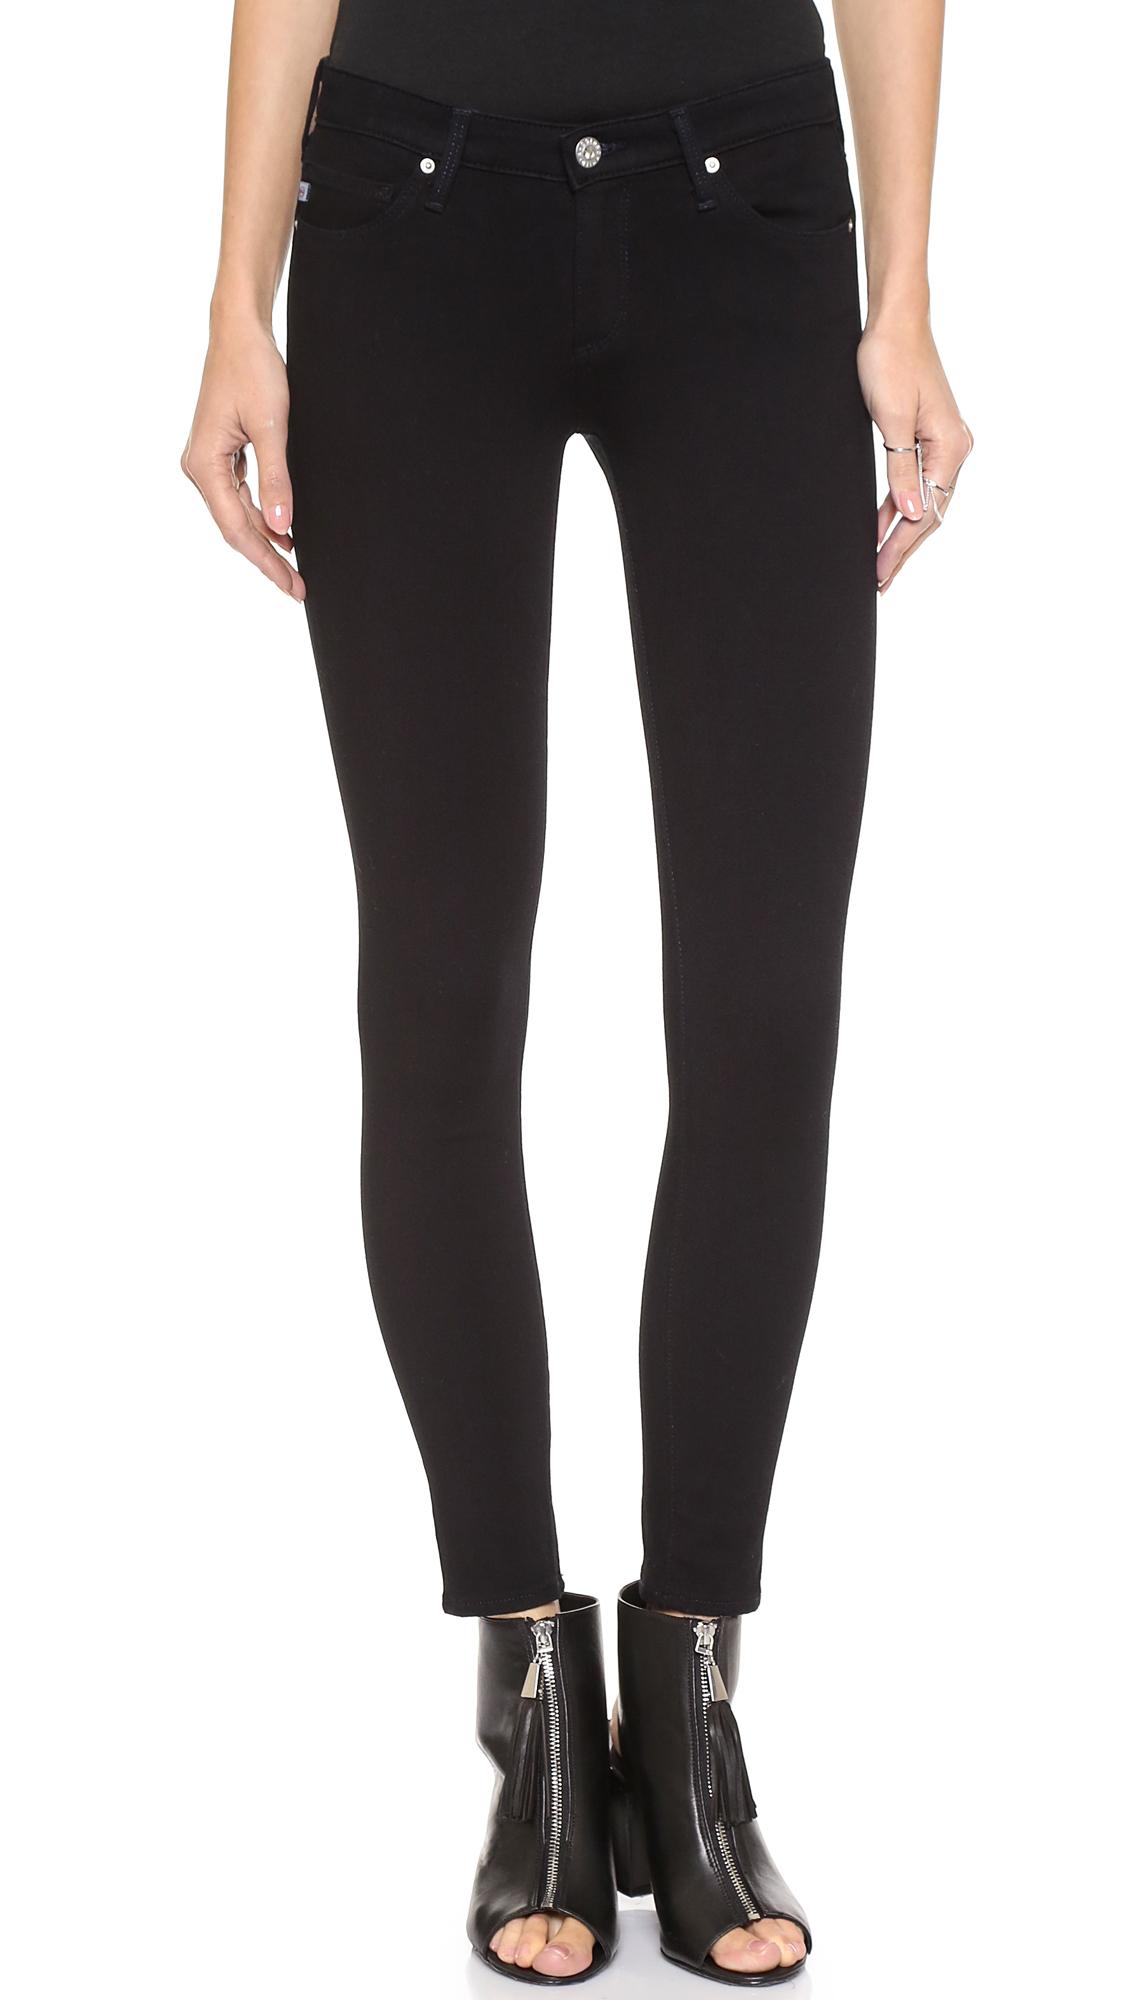 Ag Contour 360 Ankle Super Skinny Jeans - Hideout at Shopbop